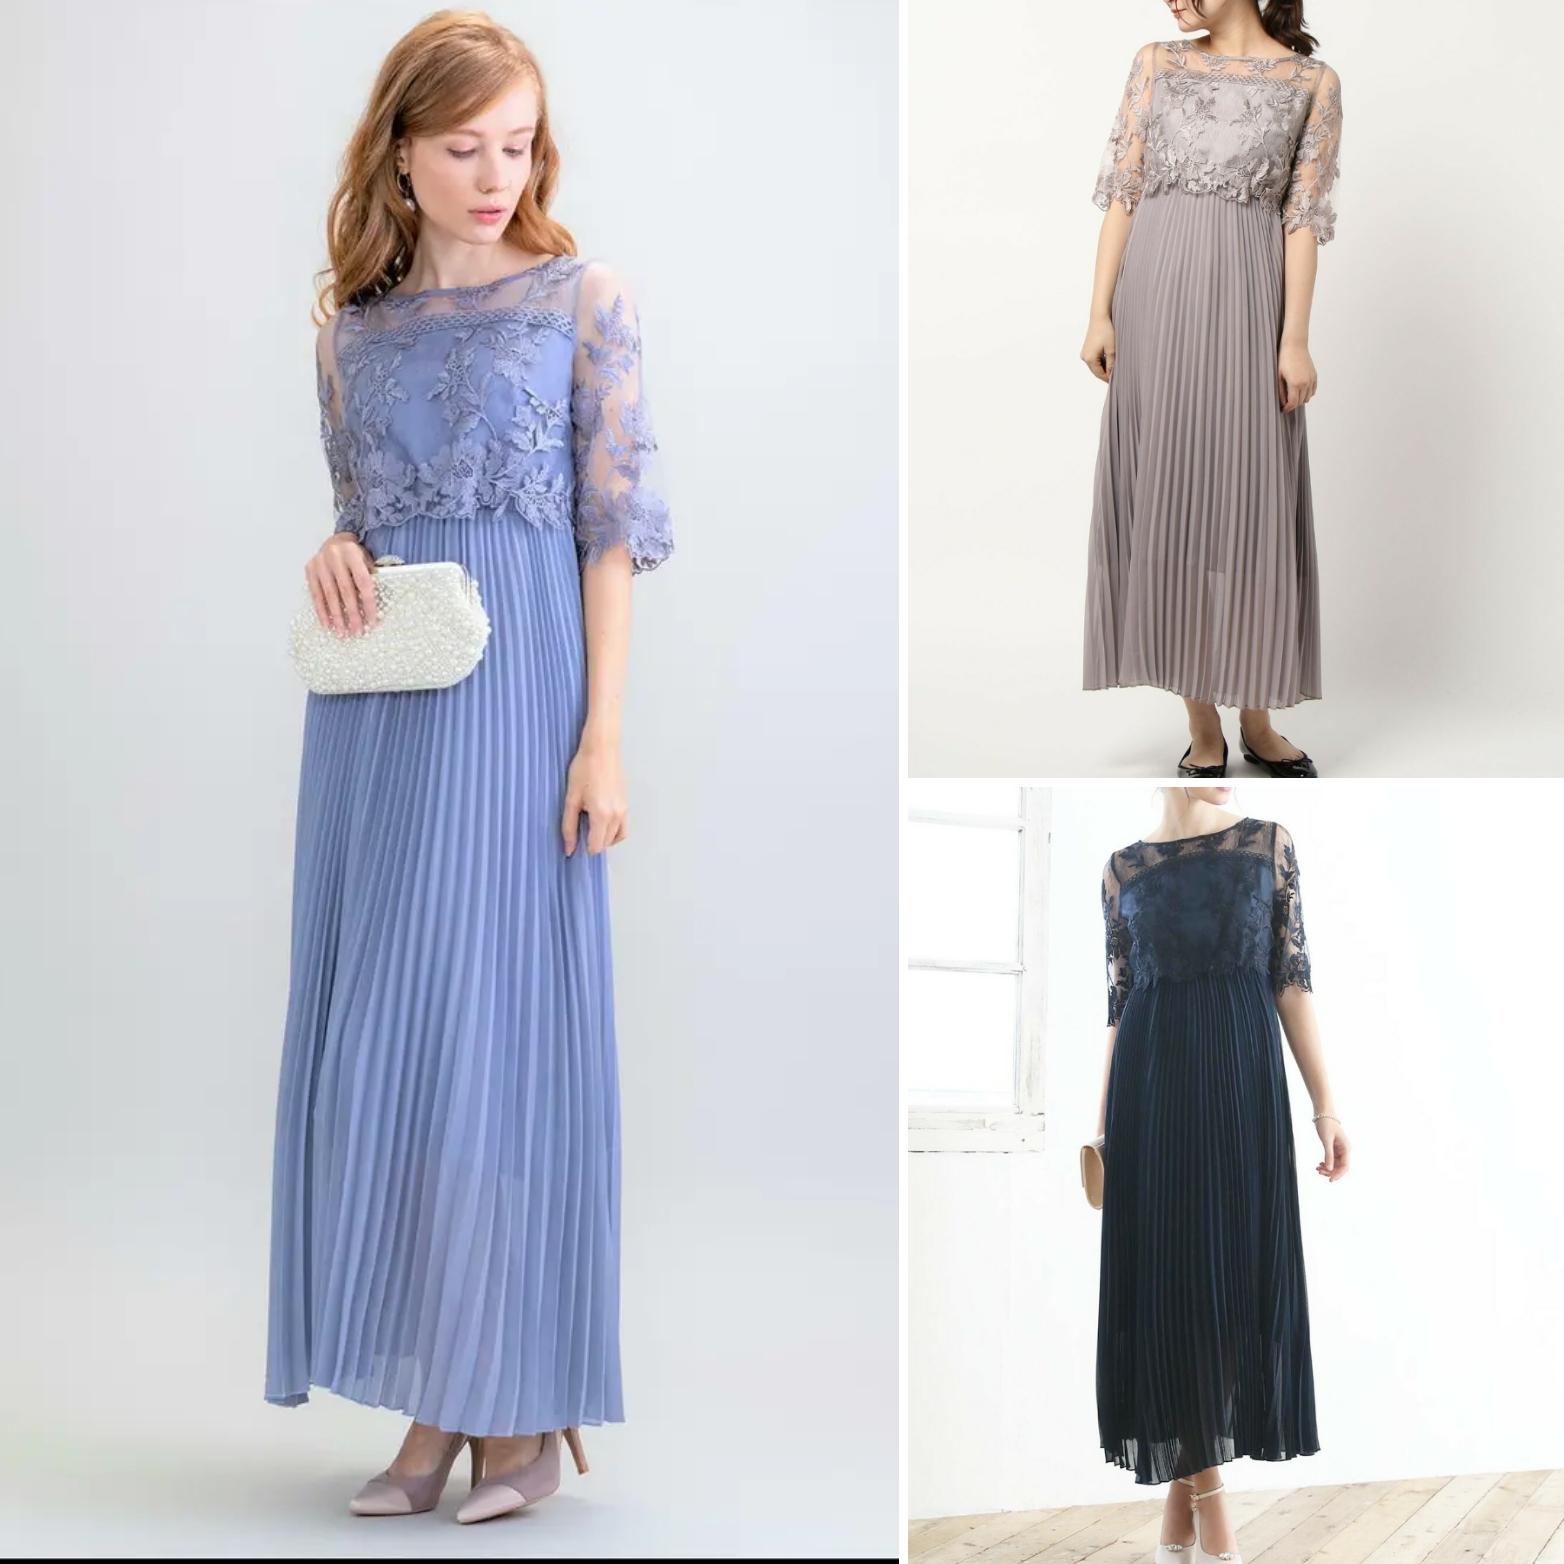 Sサイズ刺繍レース切り替えプリーツスカートロングワンピース 袖付きドレスう